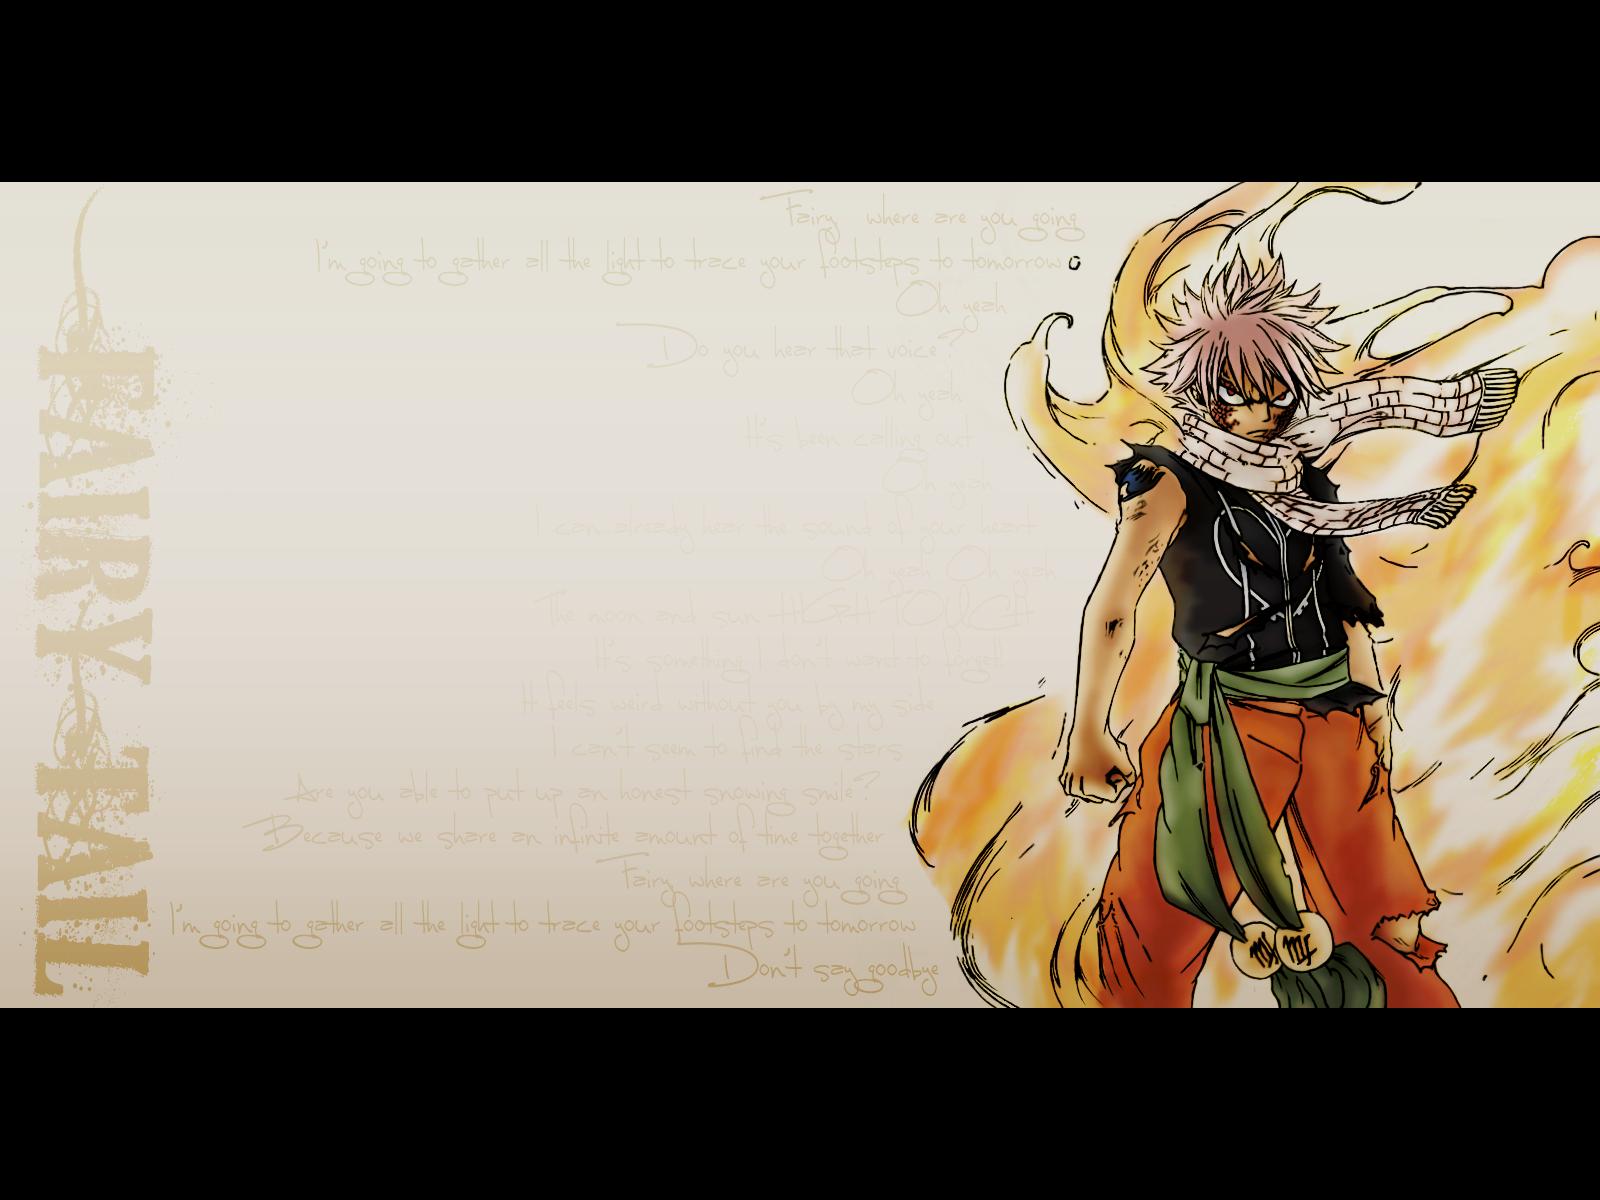 http://fc09.deviantart.net/fs51/f/2009/315/c/2/Fairy_Tail_BG_Series_1___Natsu_by_Sri_sama.png